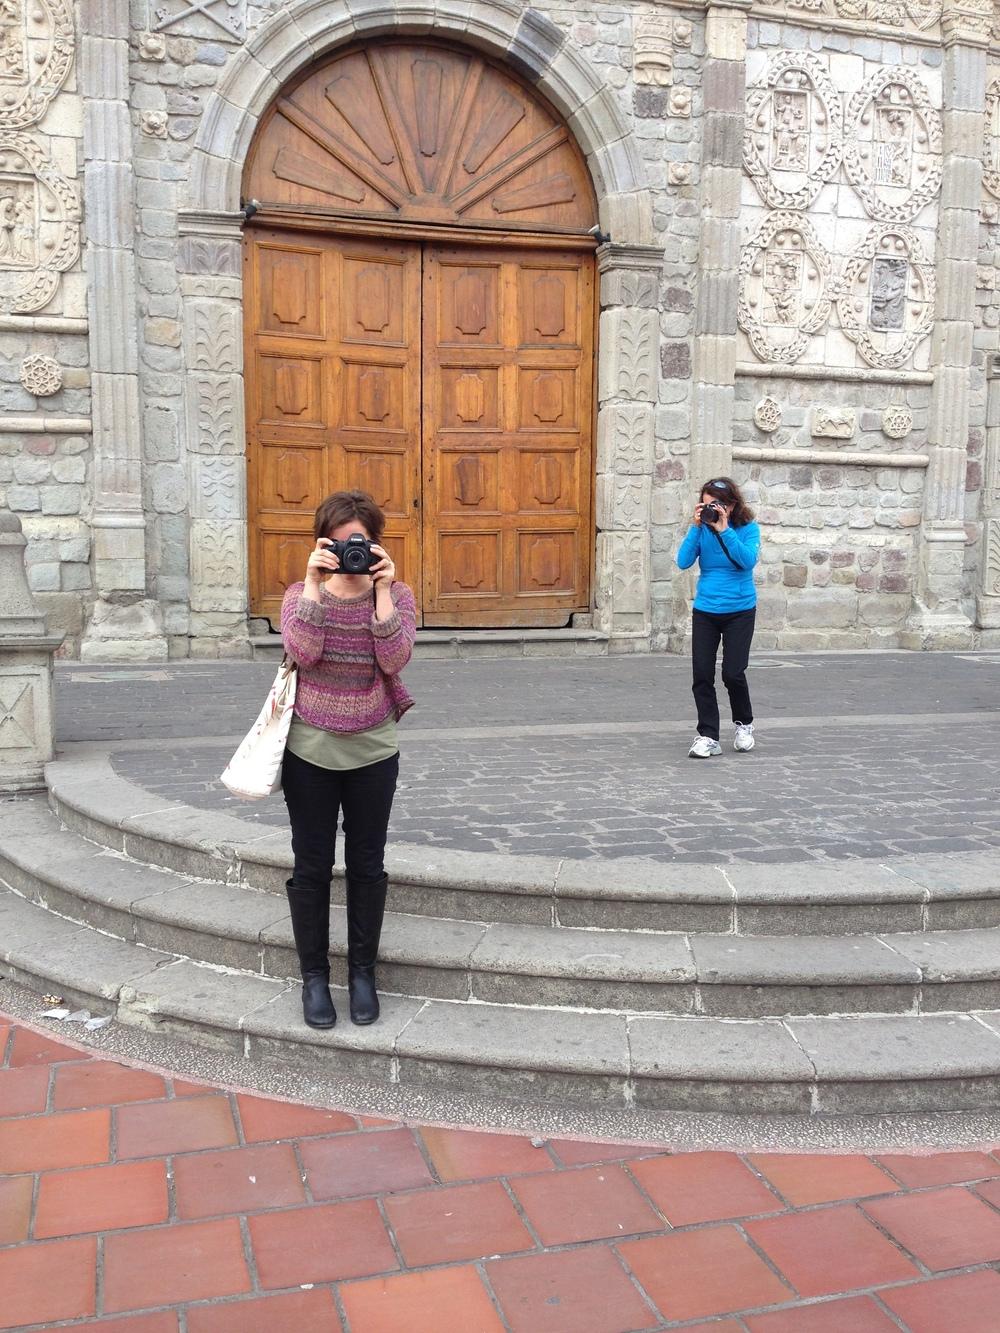 Tourists in Riobamba